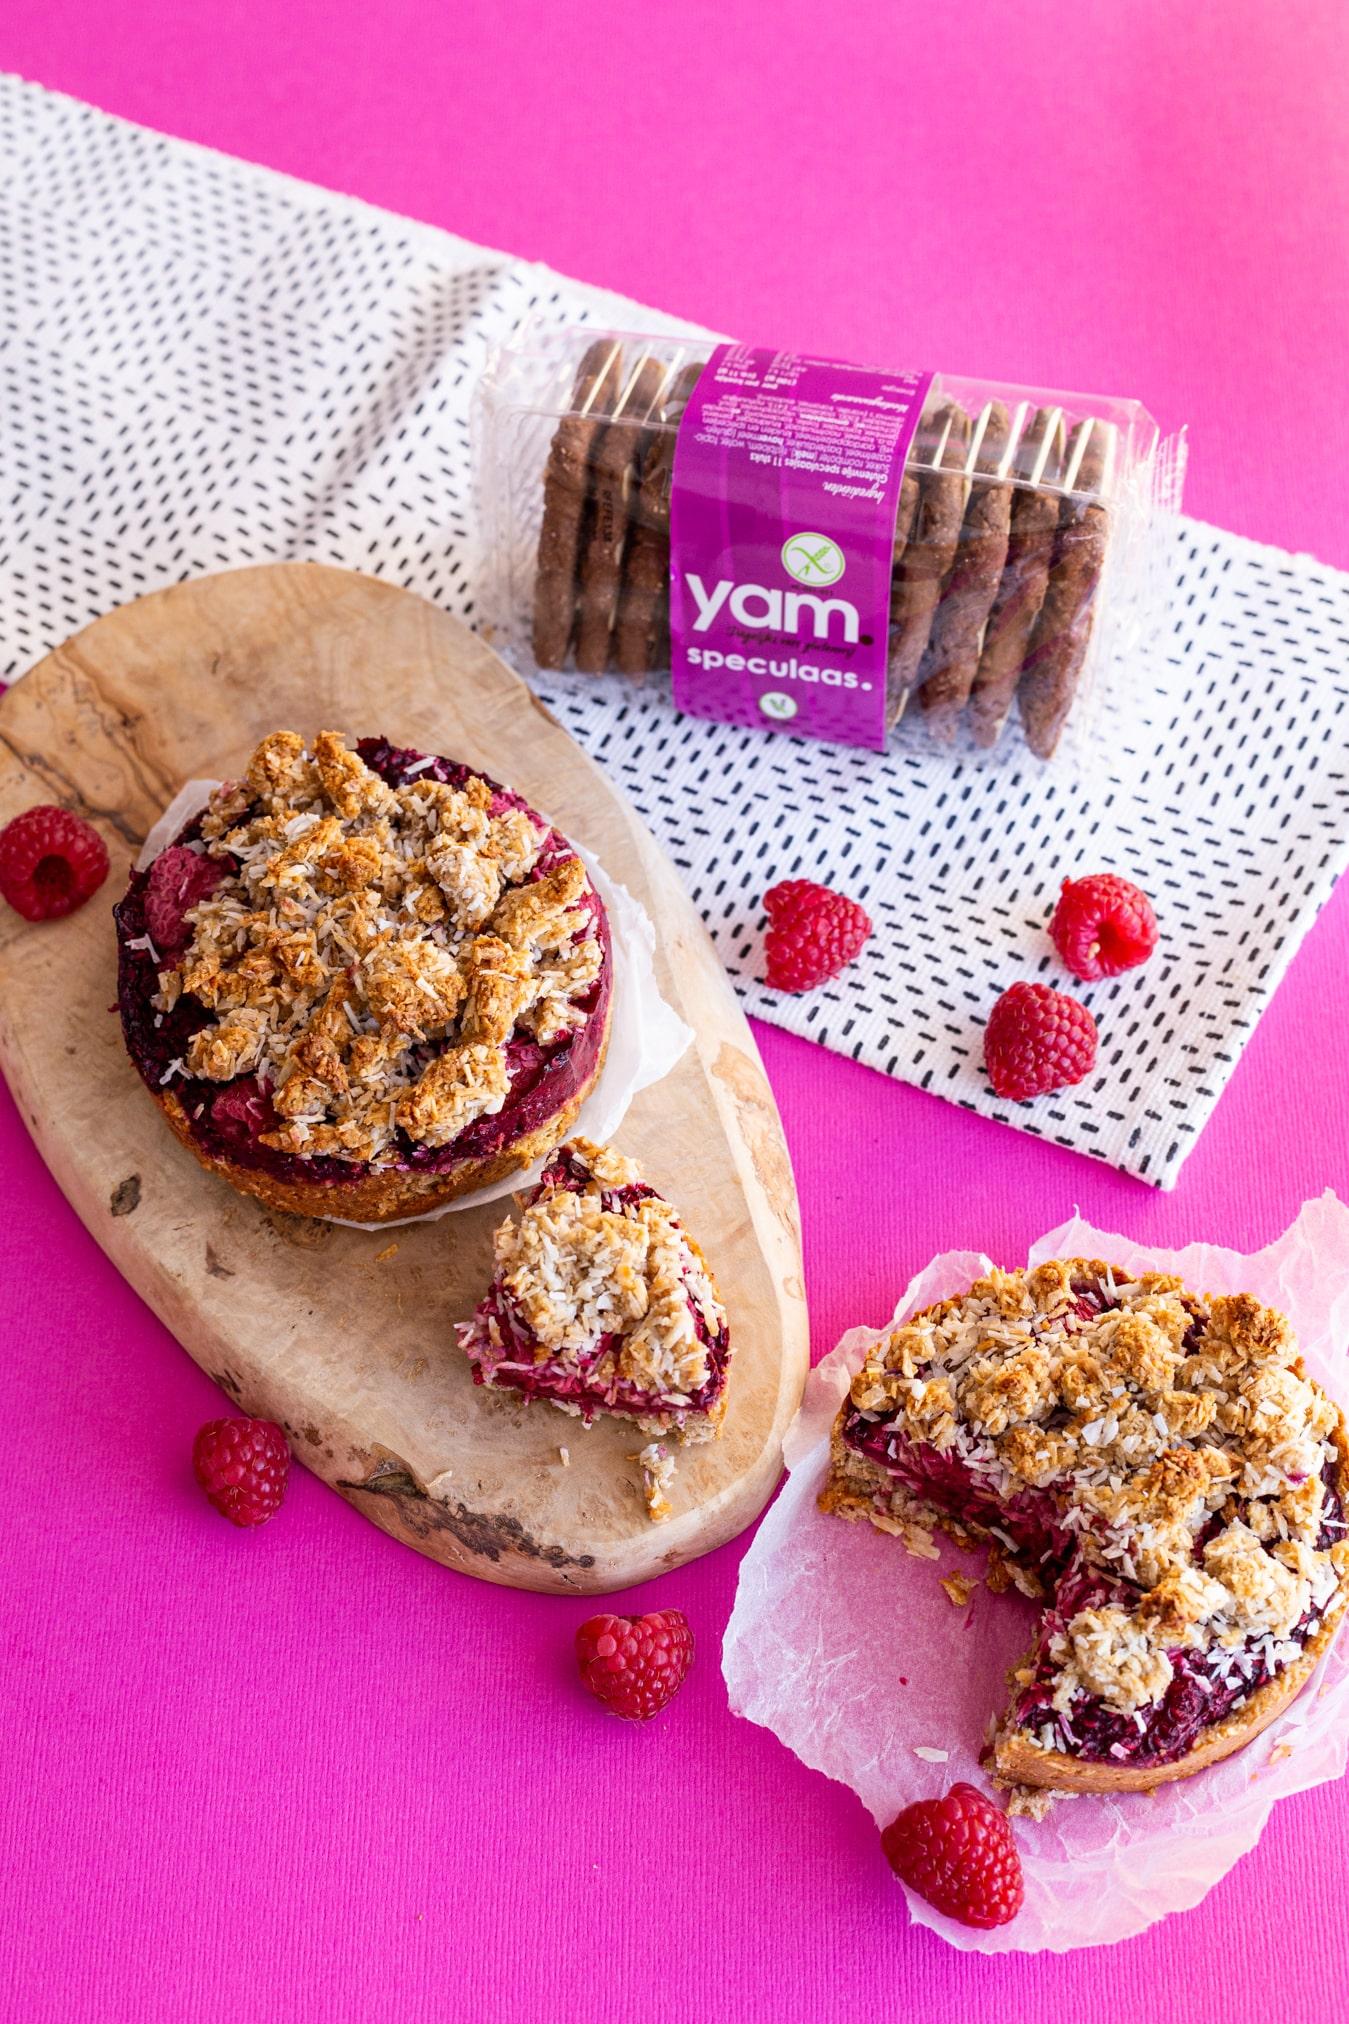 Glutenvrije kruimeltaartjes met YAM speculaas